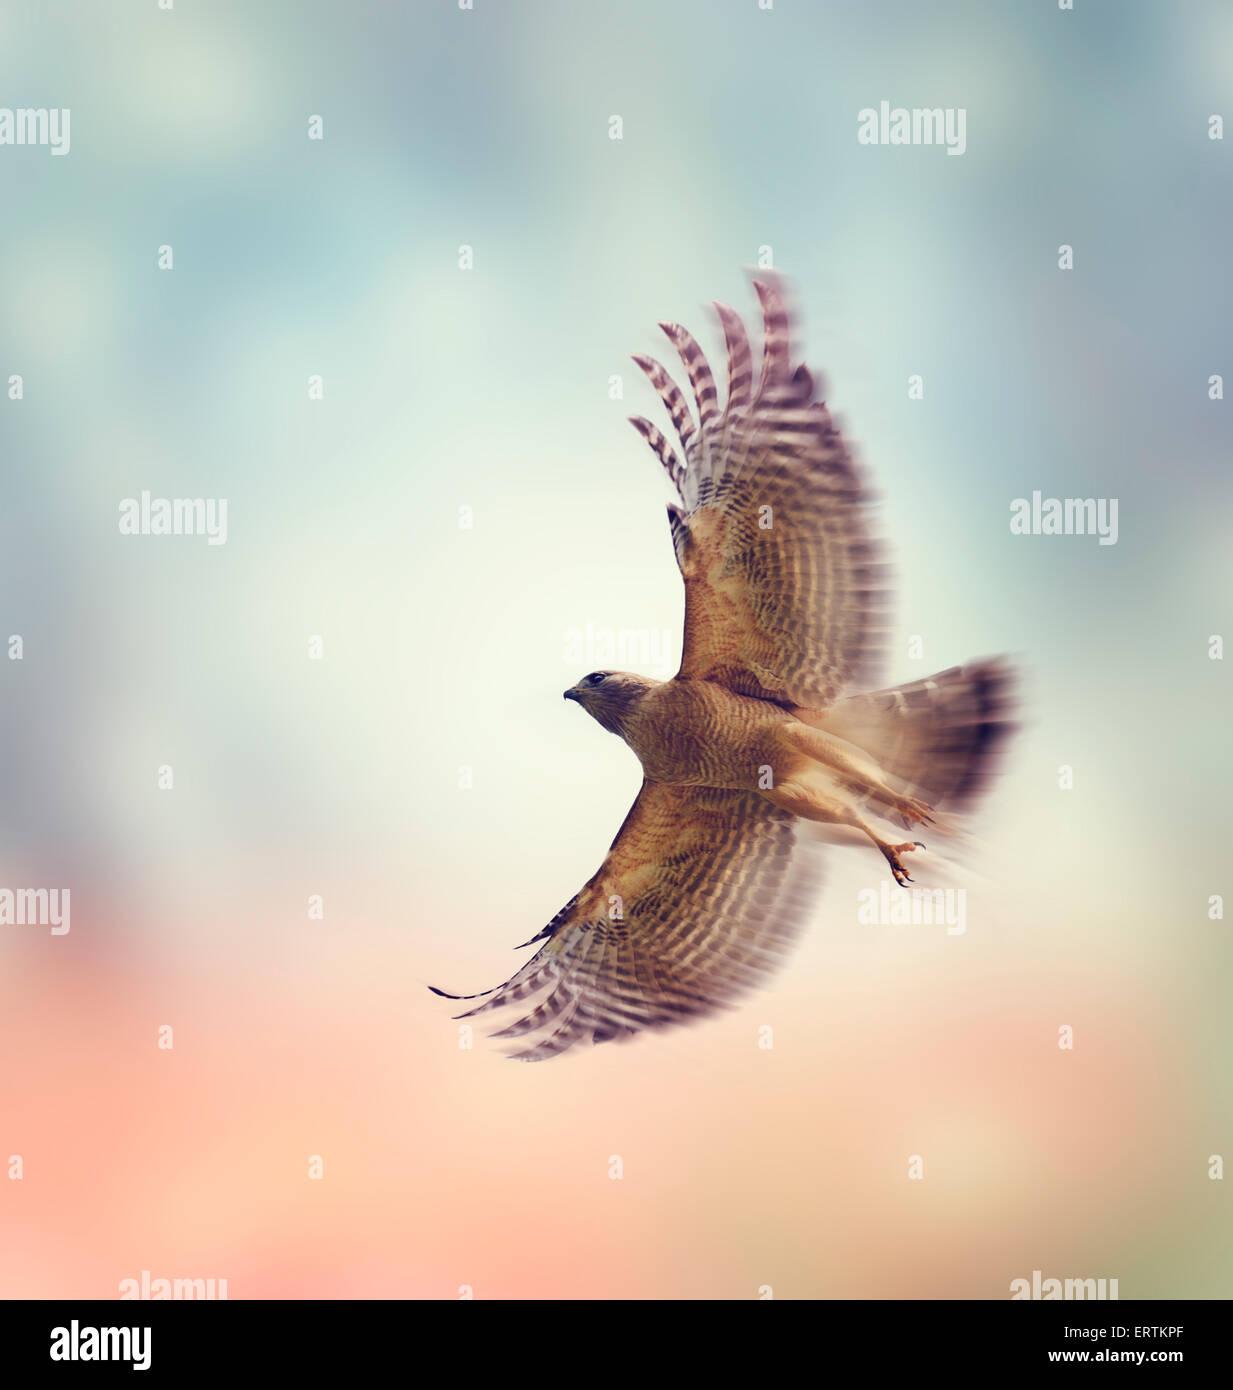 Red Shouldered Hawk In Flight - Stock Image